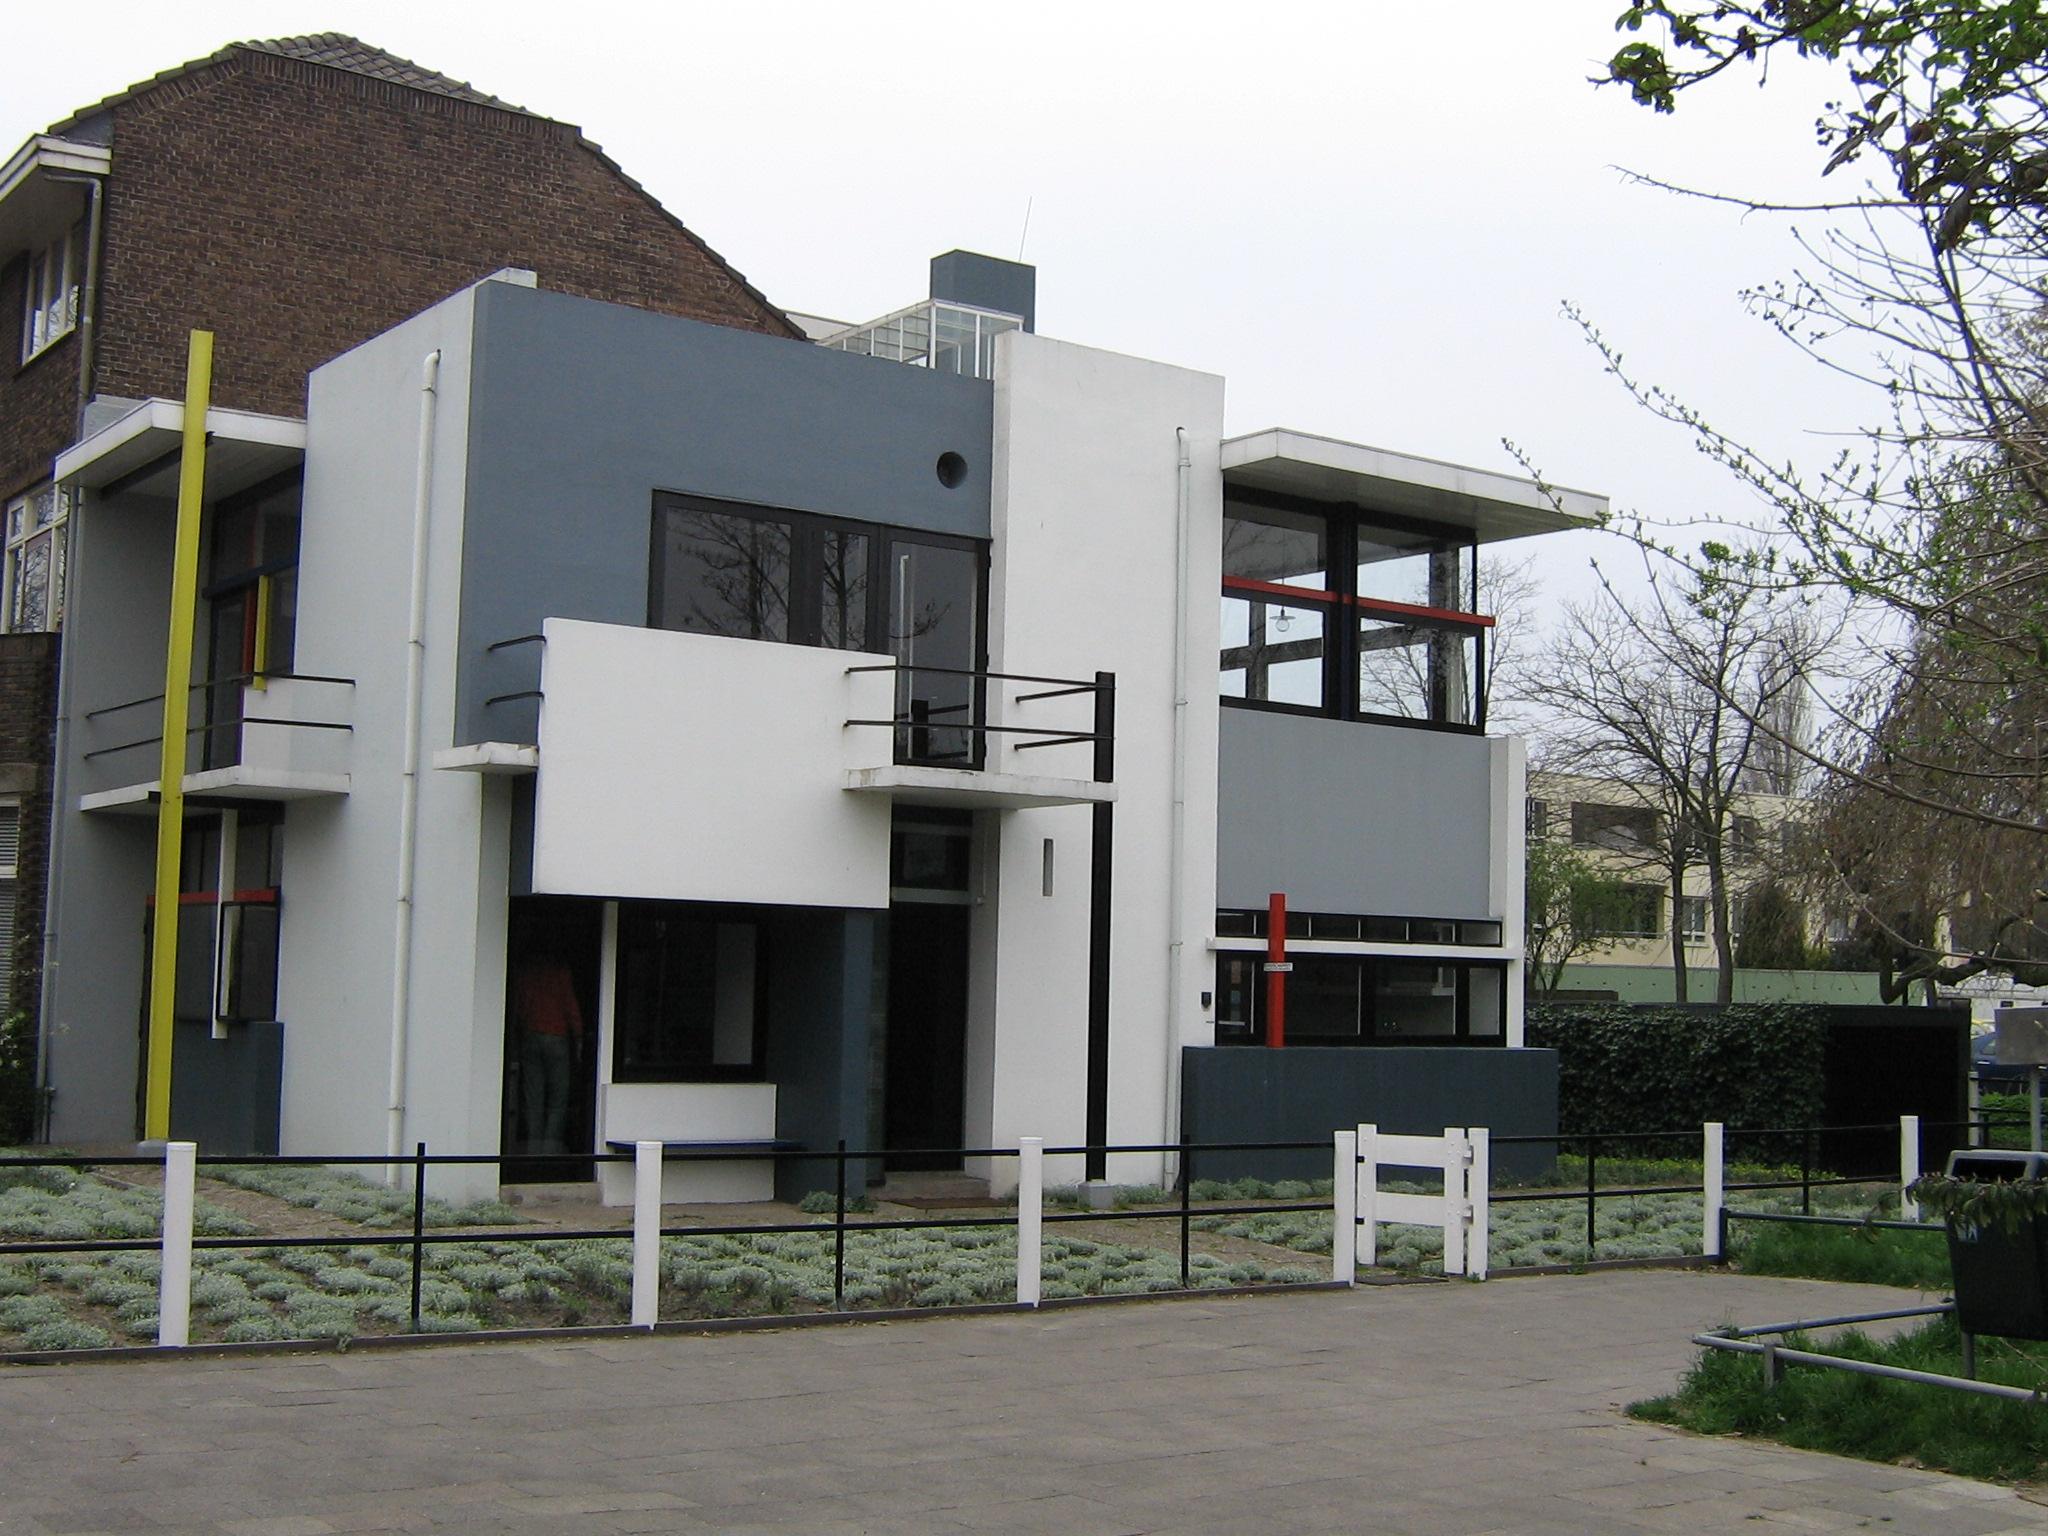 Ejemplo de arquitectura De Stijl. Rietveld Schroeder House.